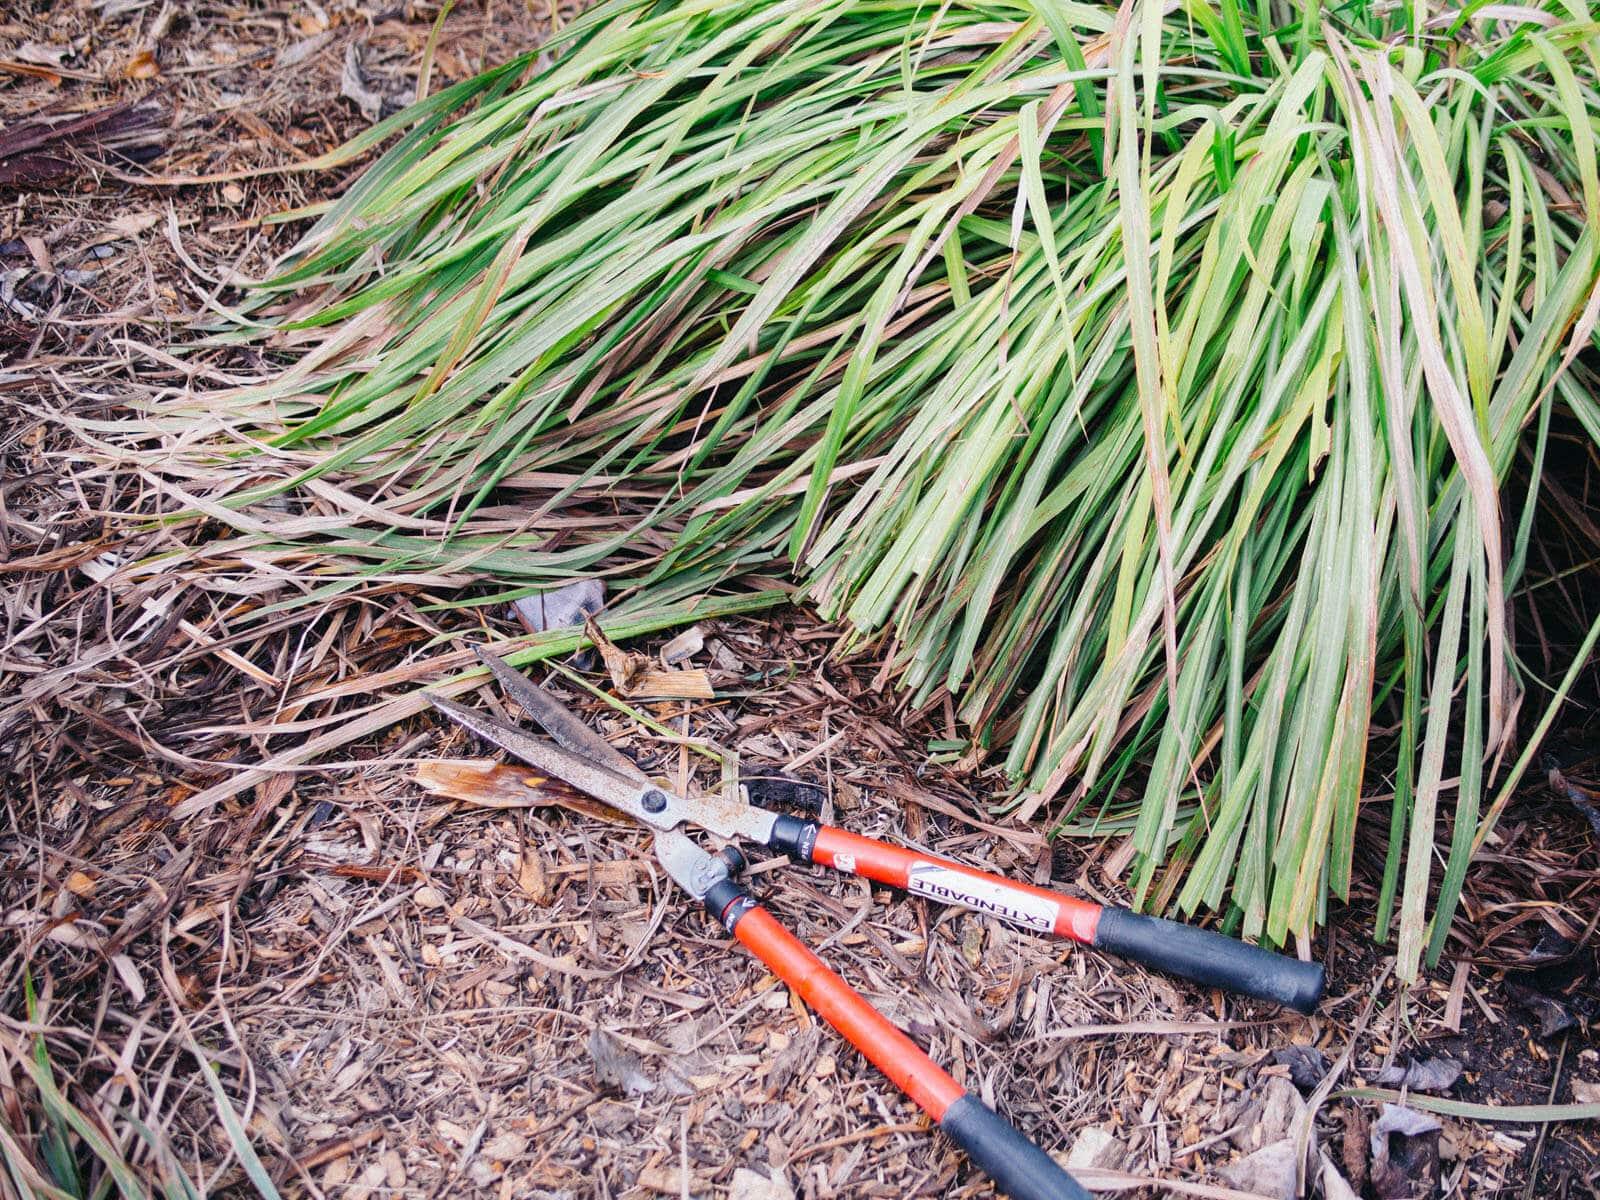 Pruning lemongrass